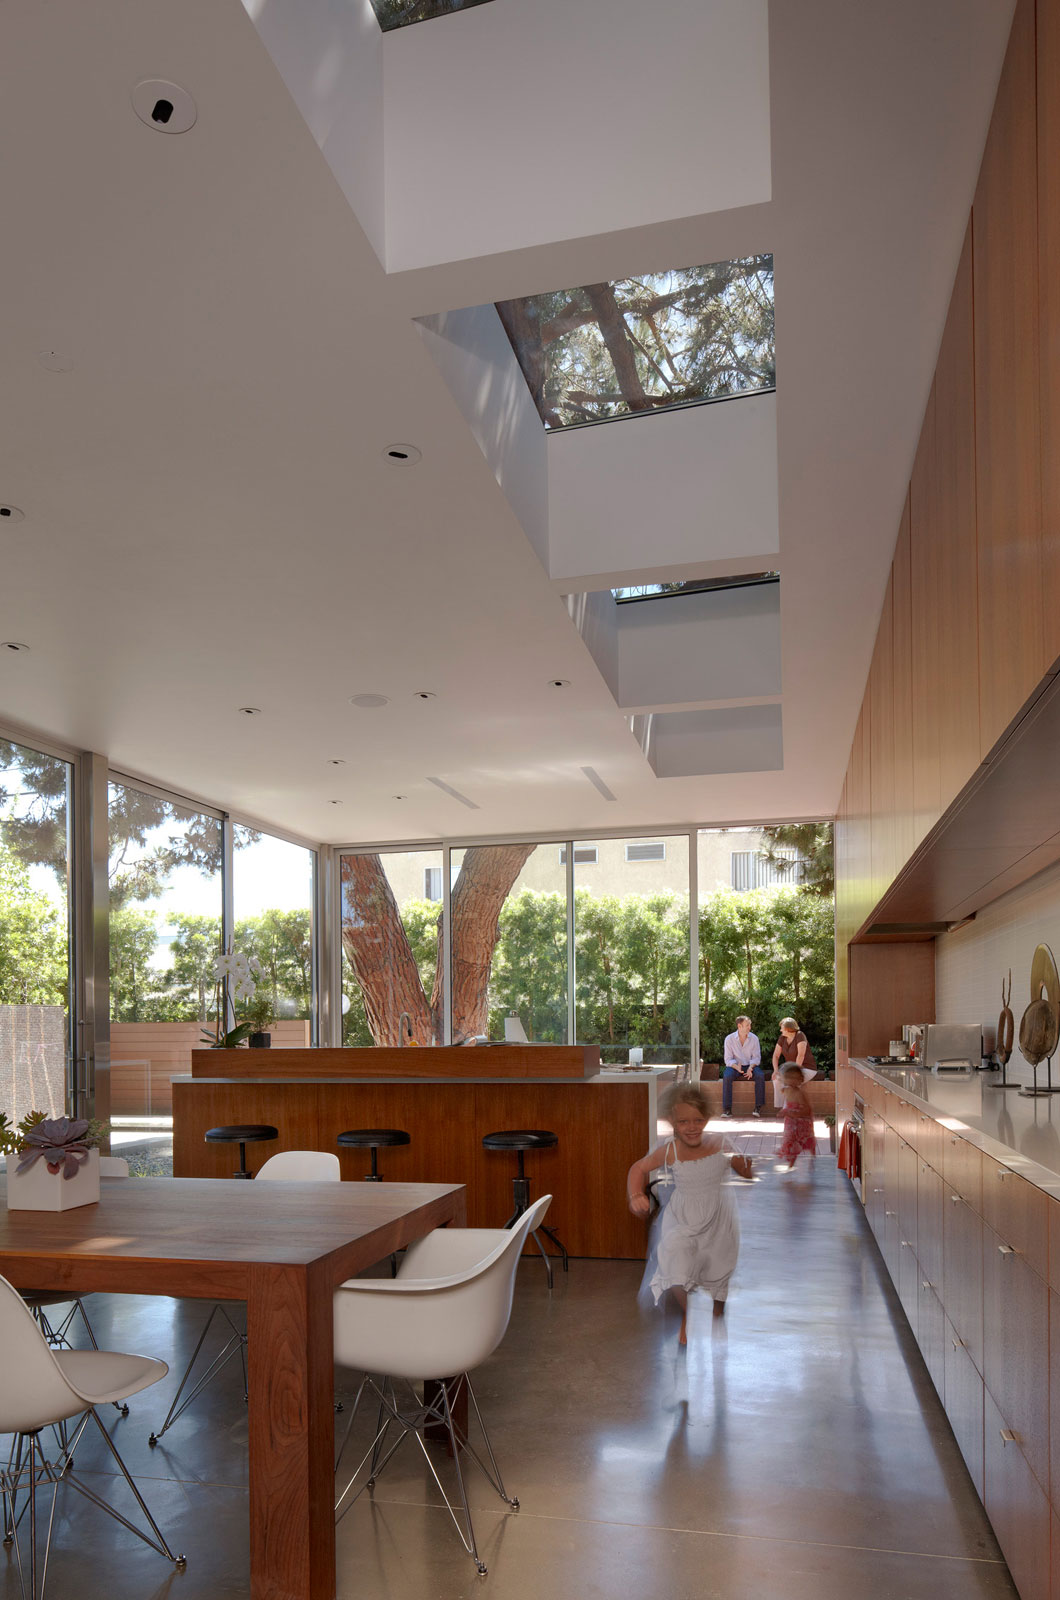 The Walnut Residence by Modal Design (6)